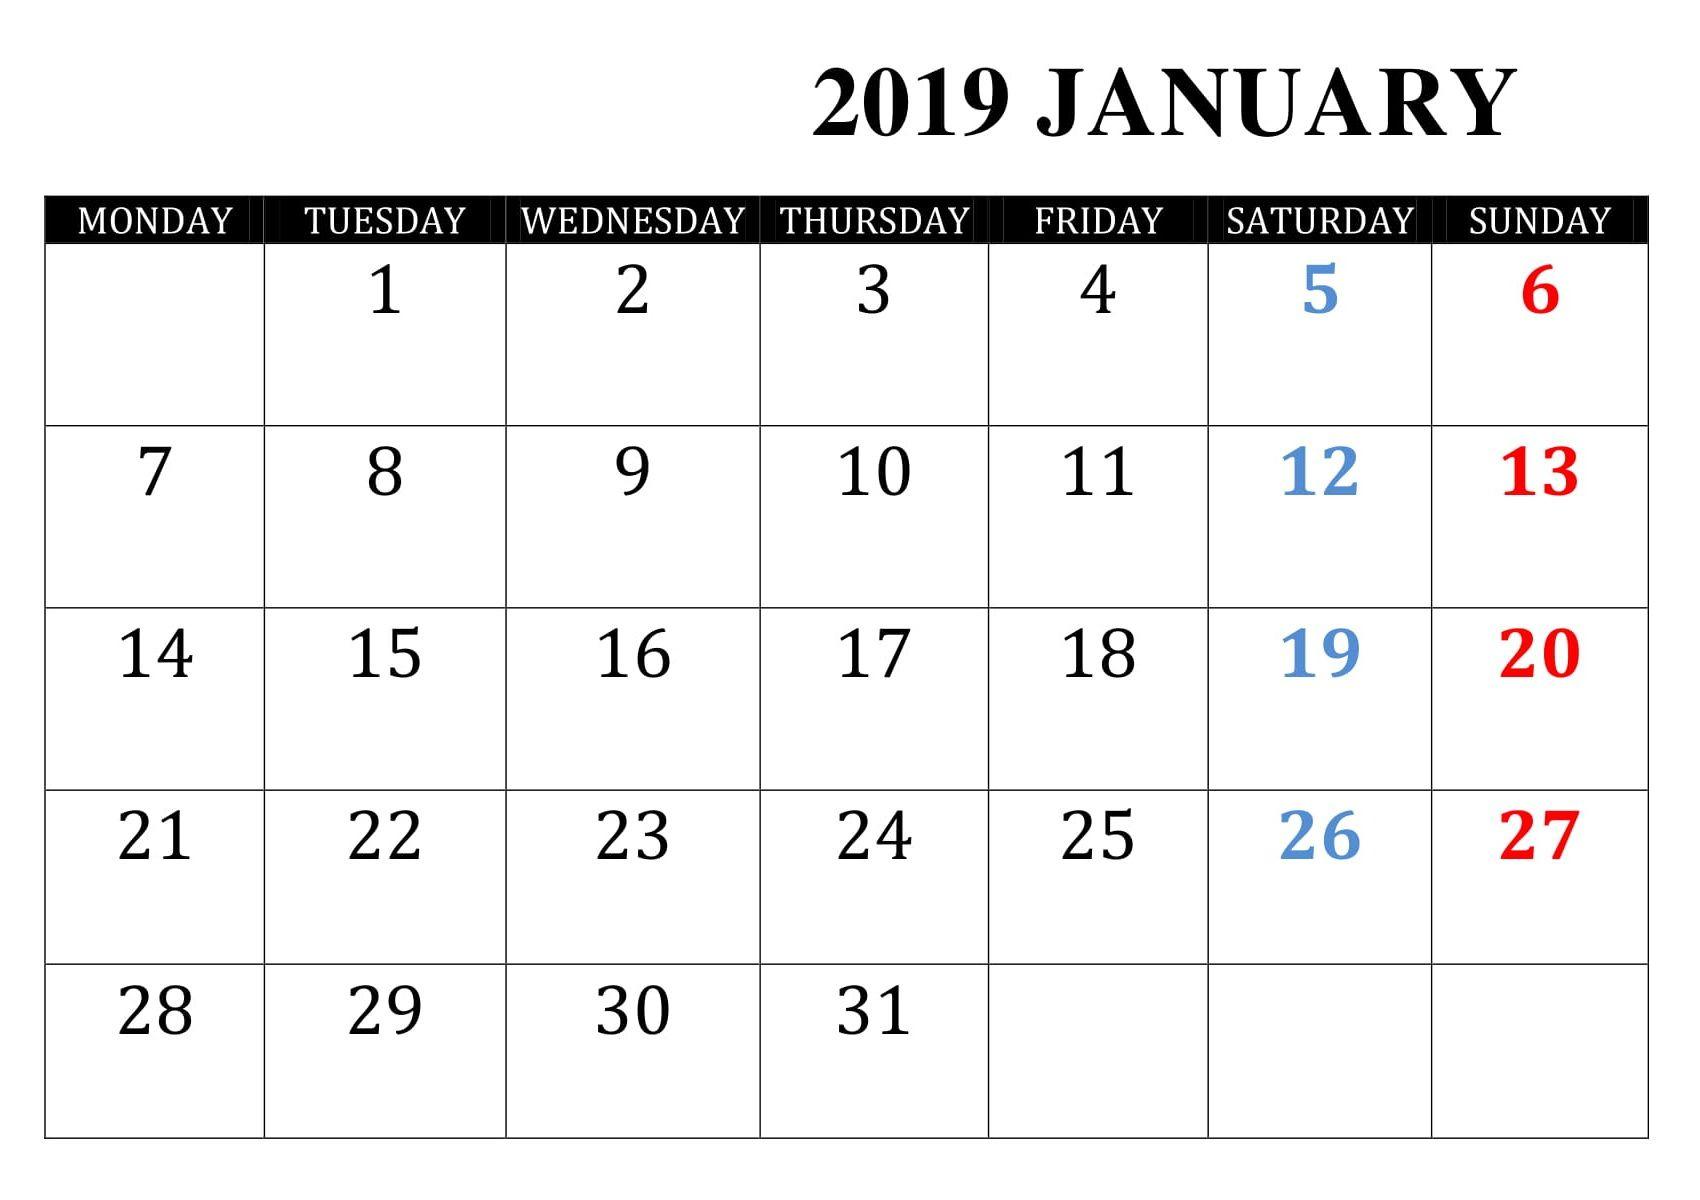 January 2019 Calendar With Holidays | 2019 Calendar inside Sunday To Saturday Calendar